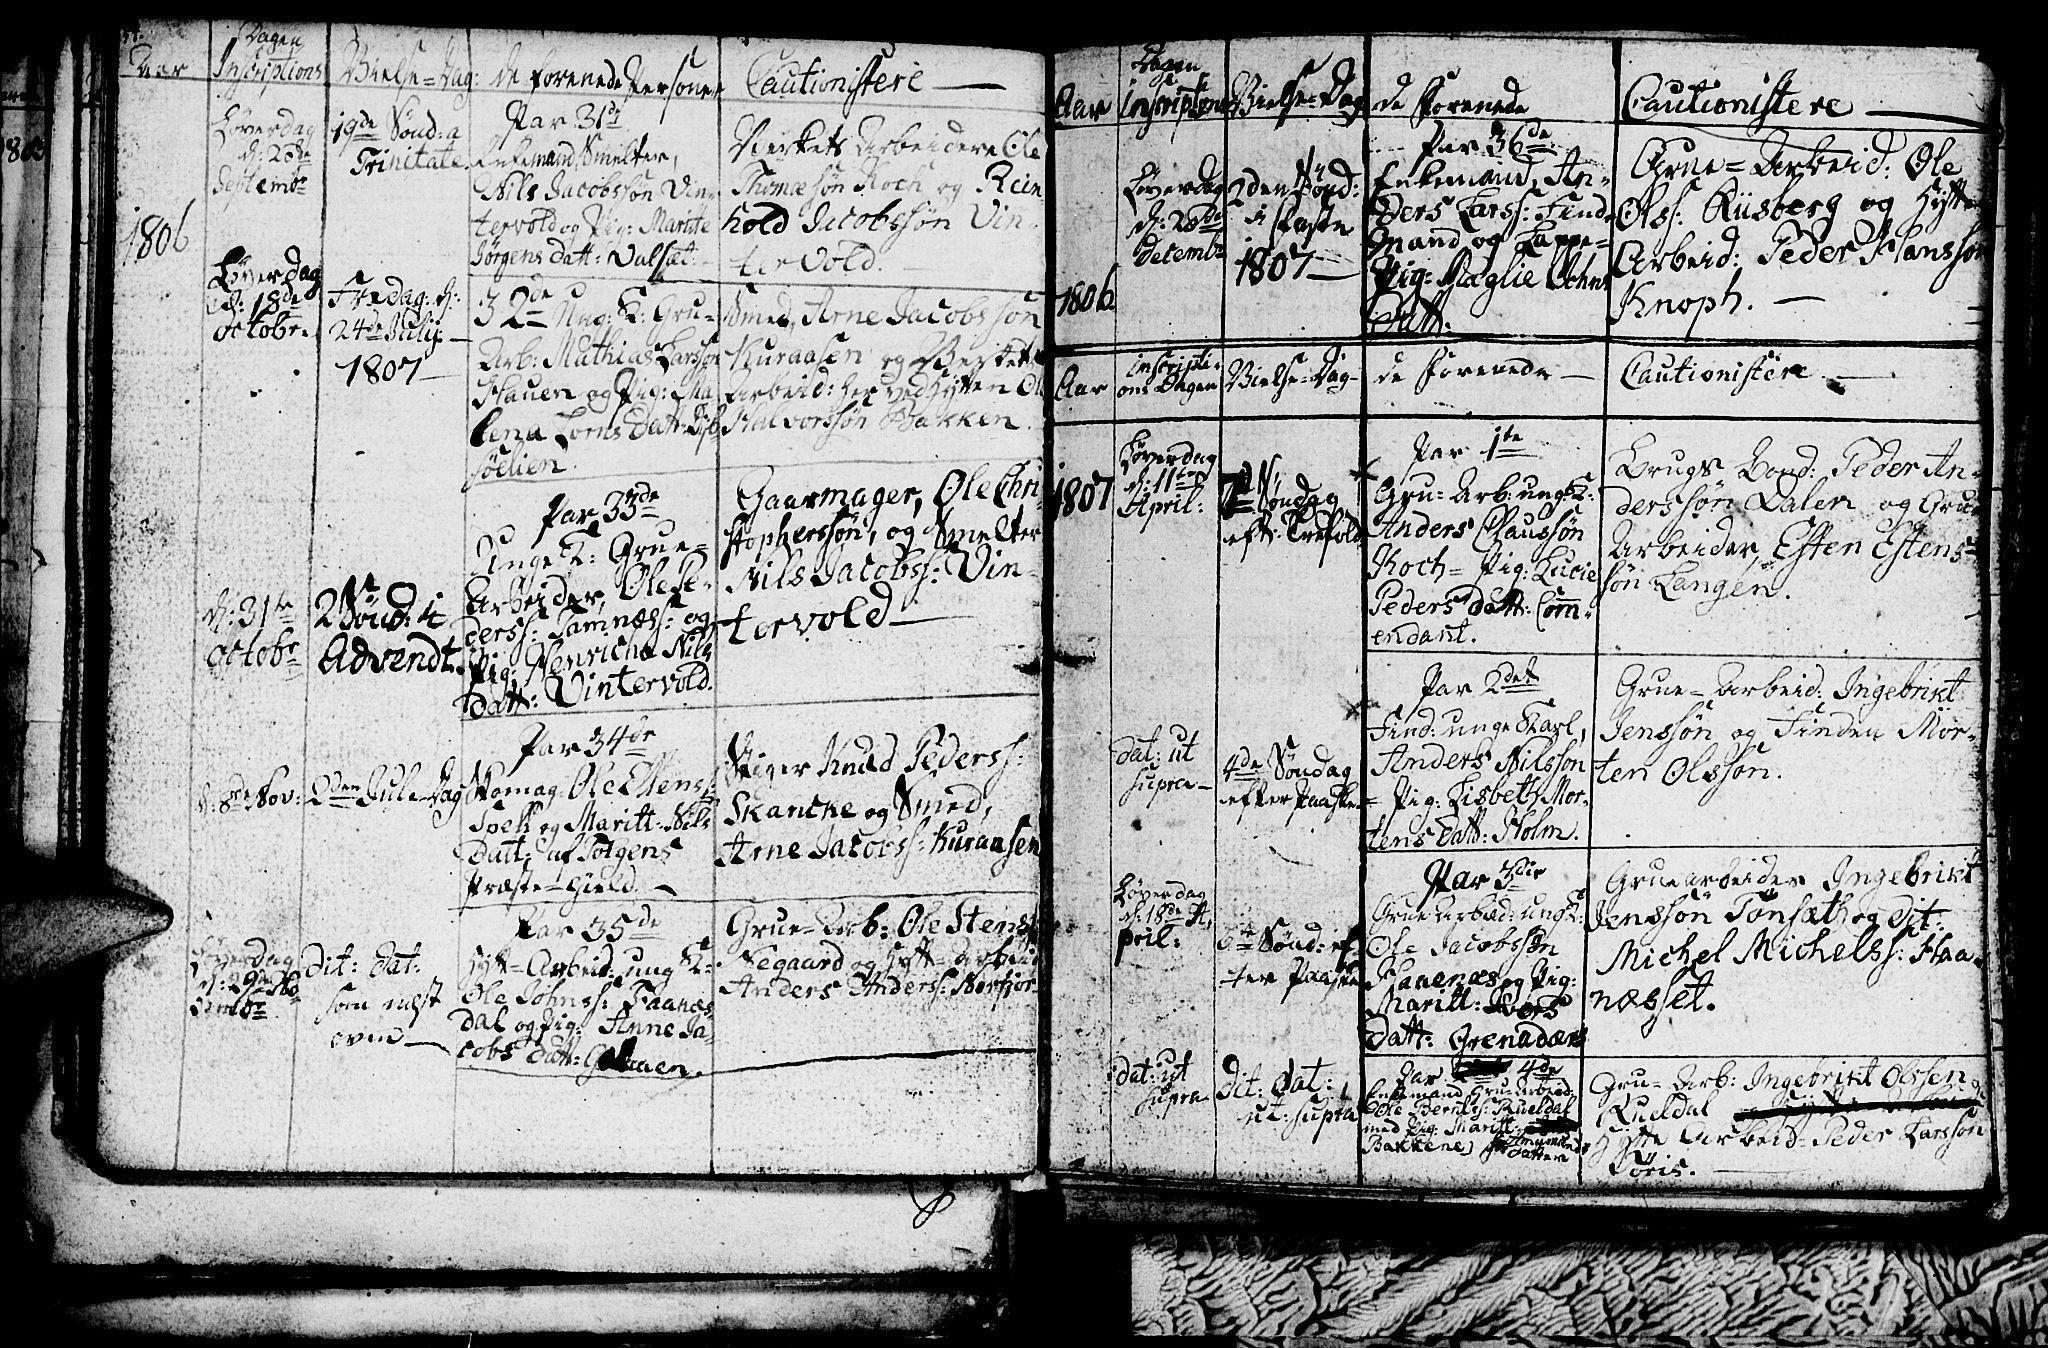 SAT, Ministerialprotokoller, klokkerbøker og fødselsregistre - Sør-Trøndelag, 681/L0937: Klokkerbok nr. 681C01, 1798-1810, s. 54a-55a